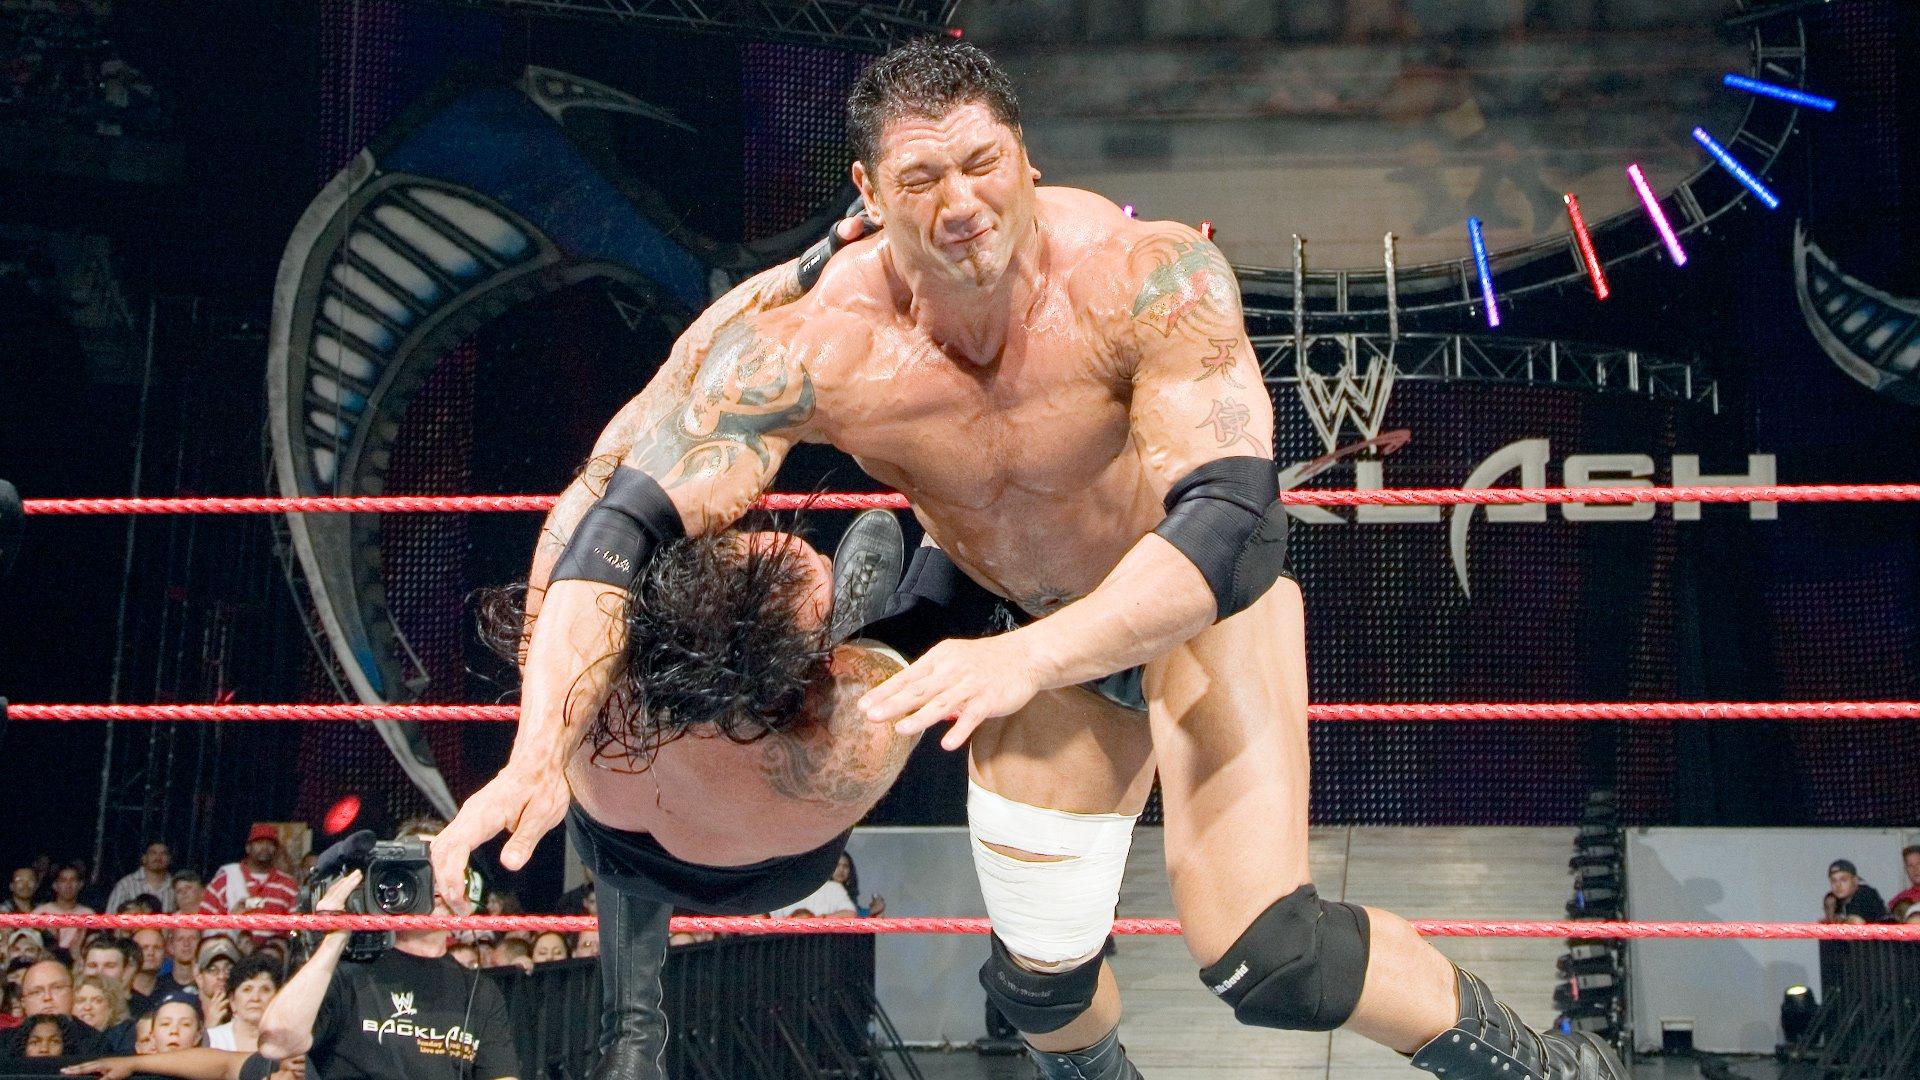 Image result for WWE Backlash 2007 Undertaker vs Batista wwe.com